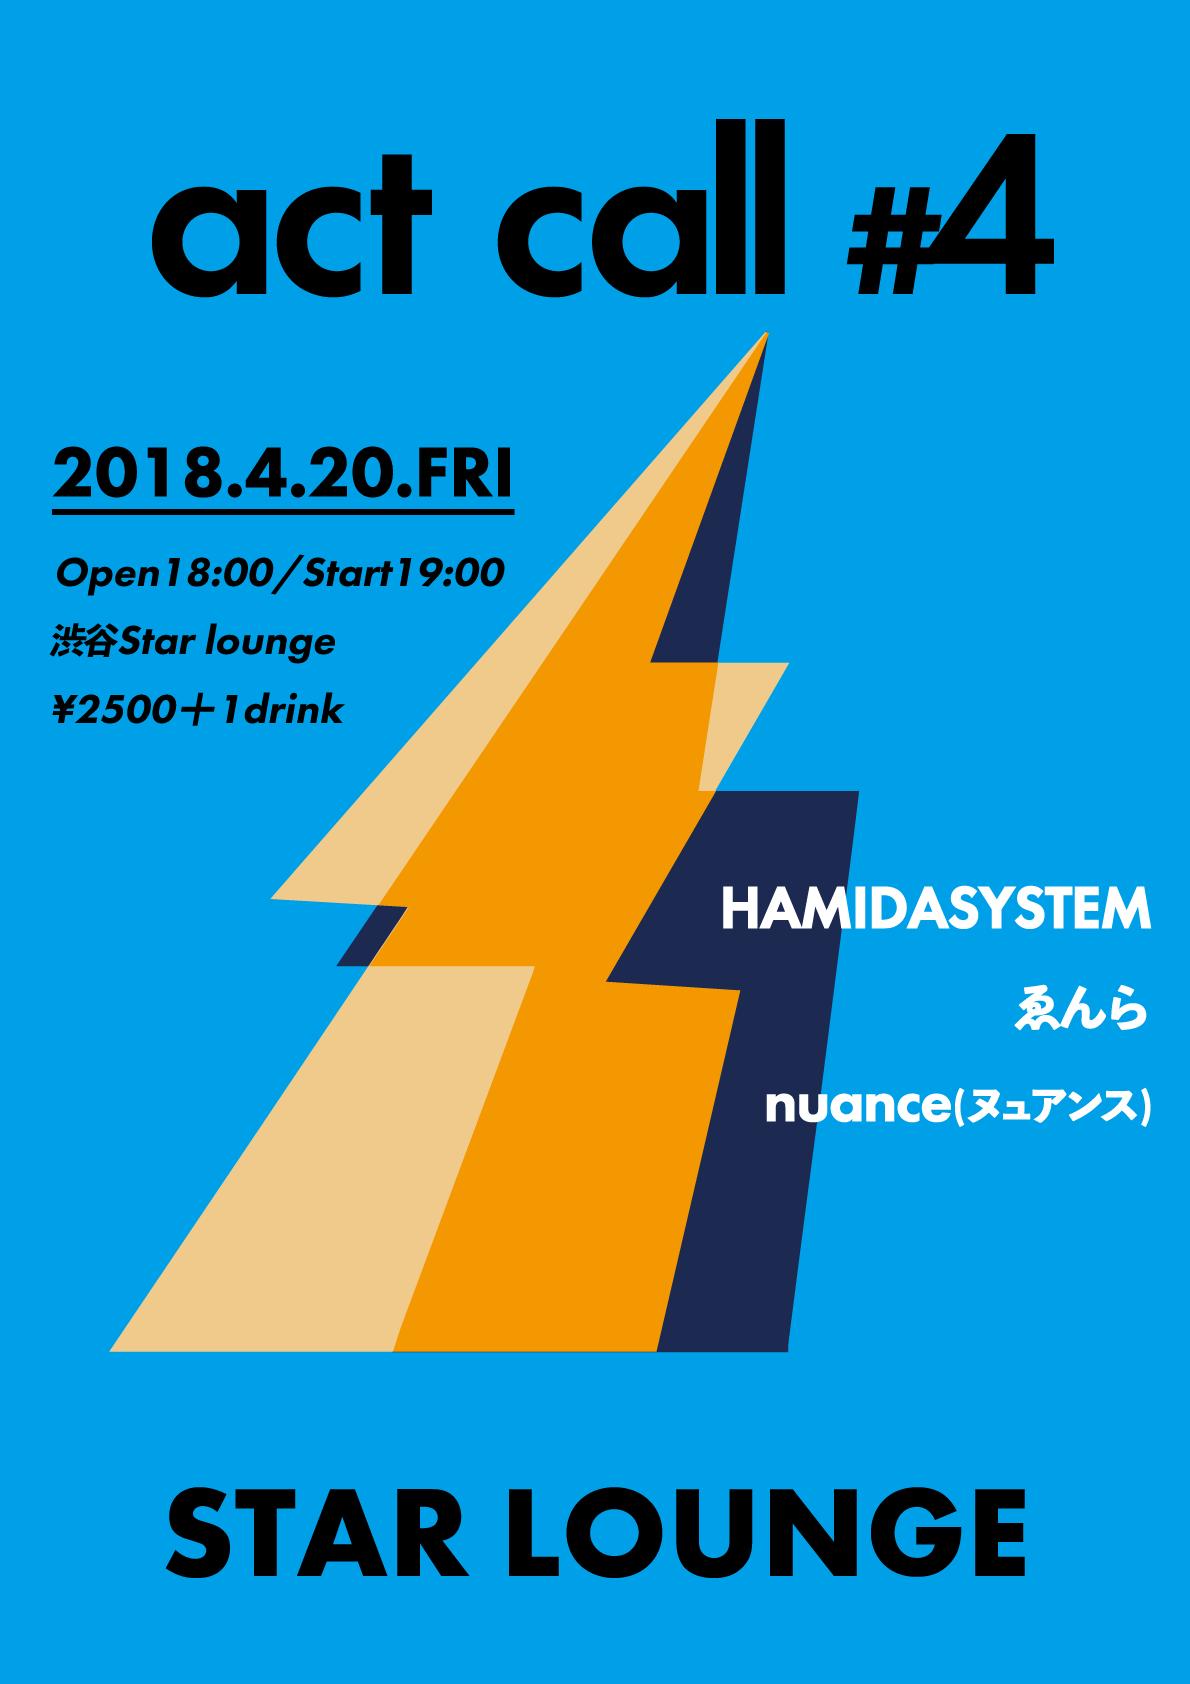 HAMIDASYSTEM presents「act call #4」